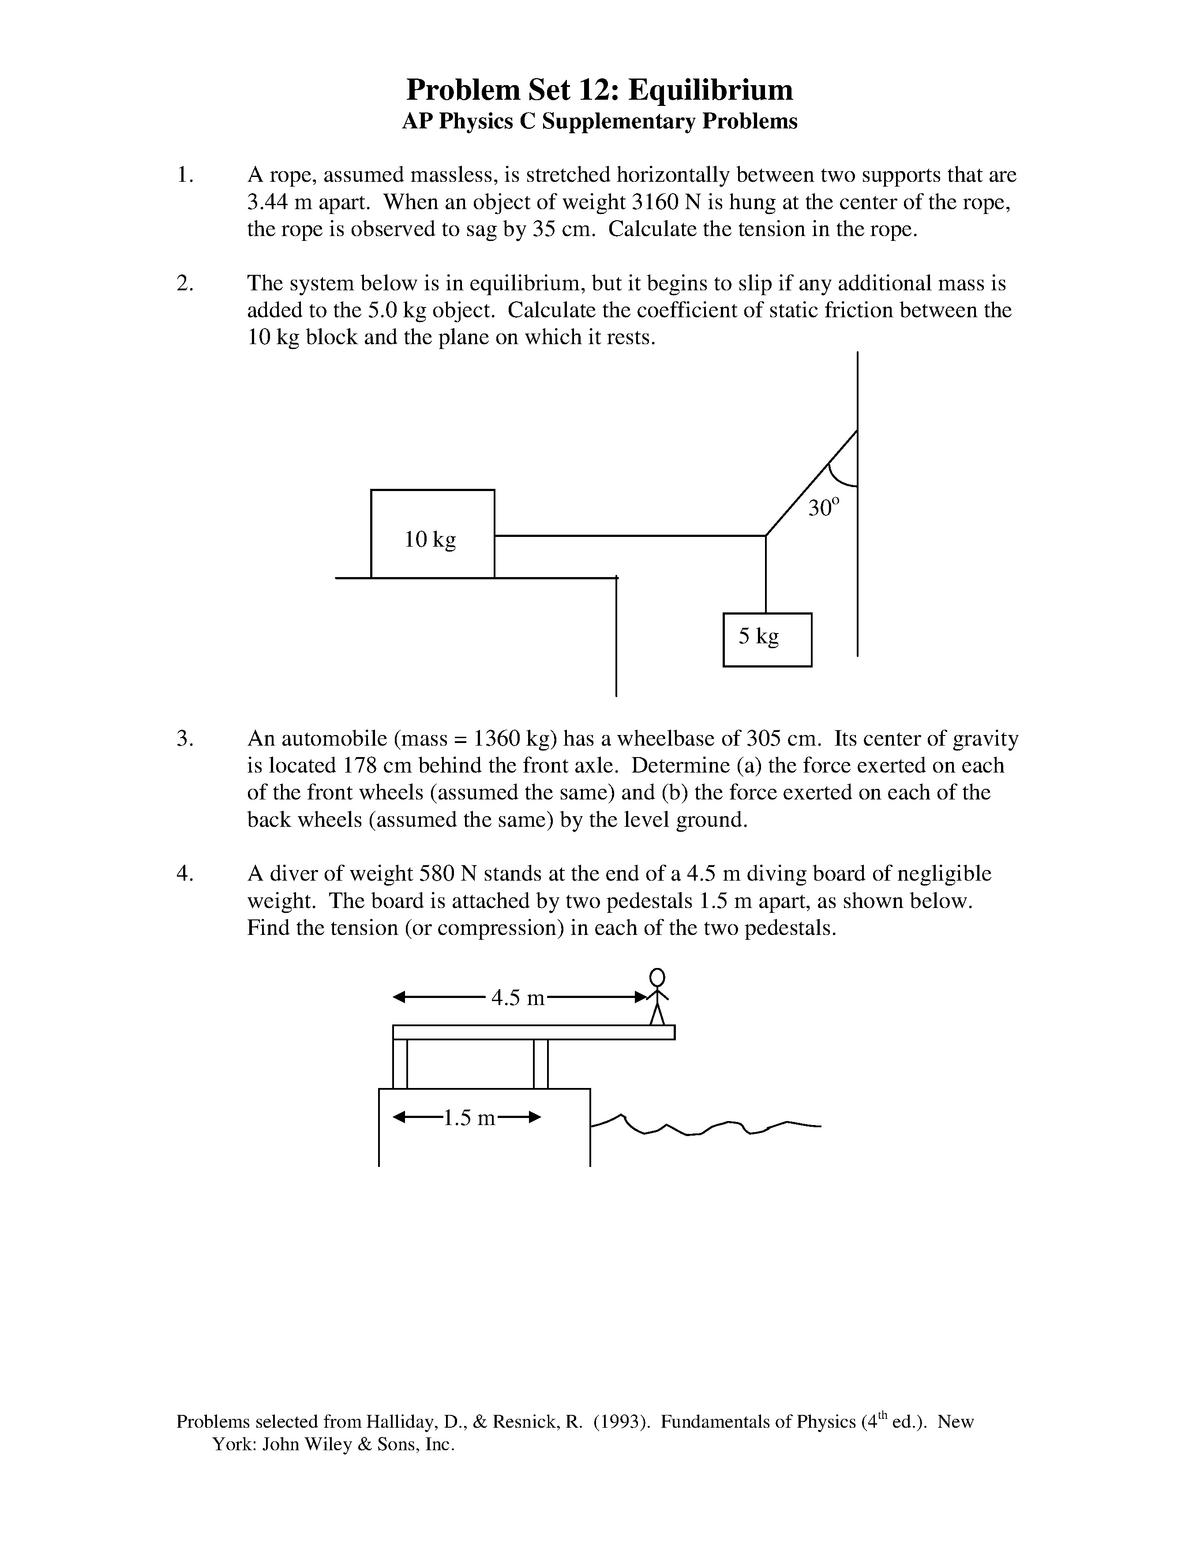 Equilibrium - PY 502: Computational Physics - StuDocu